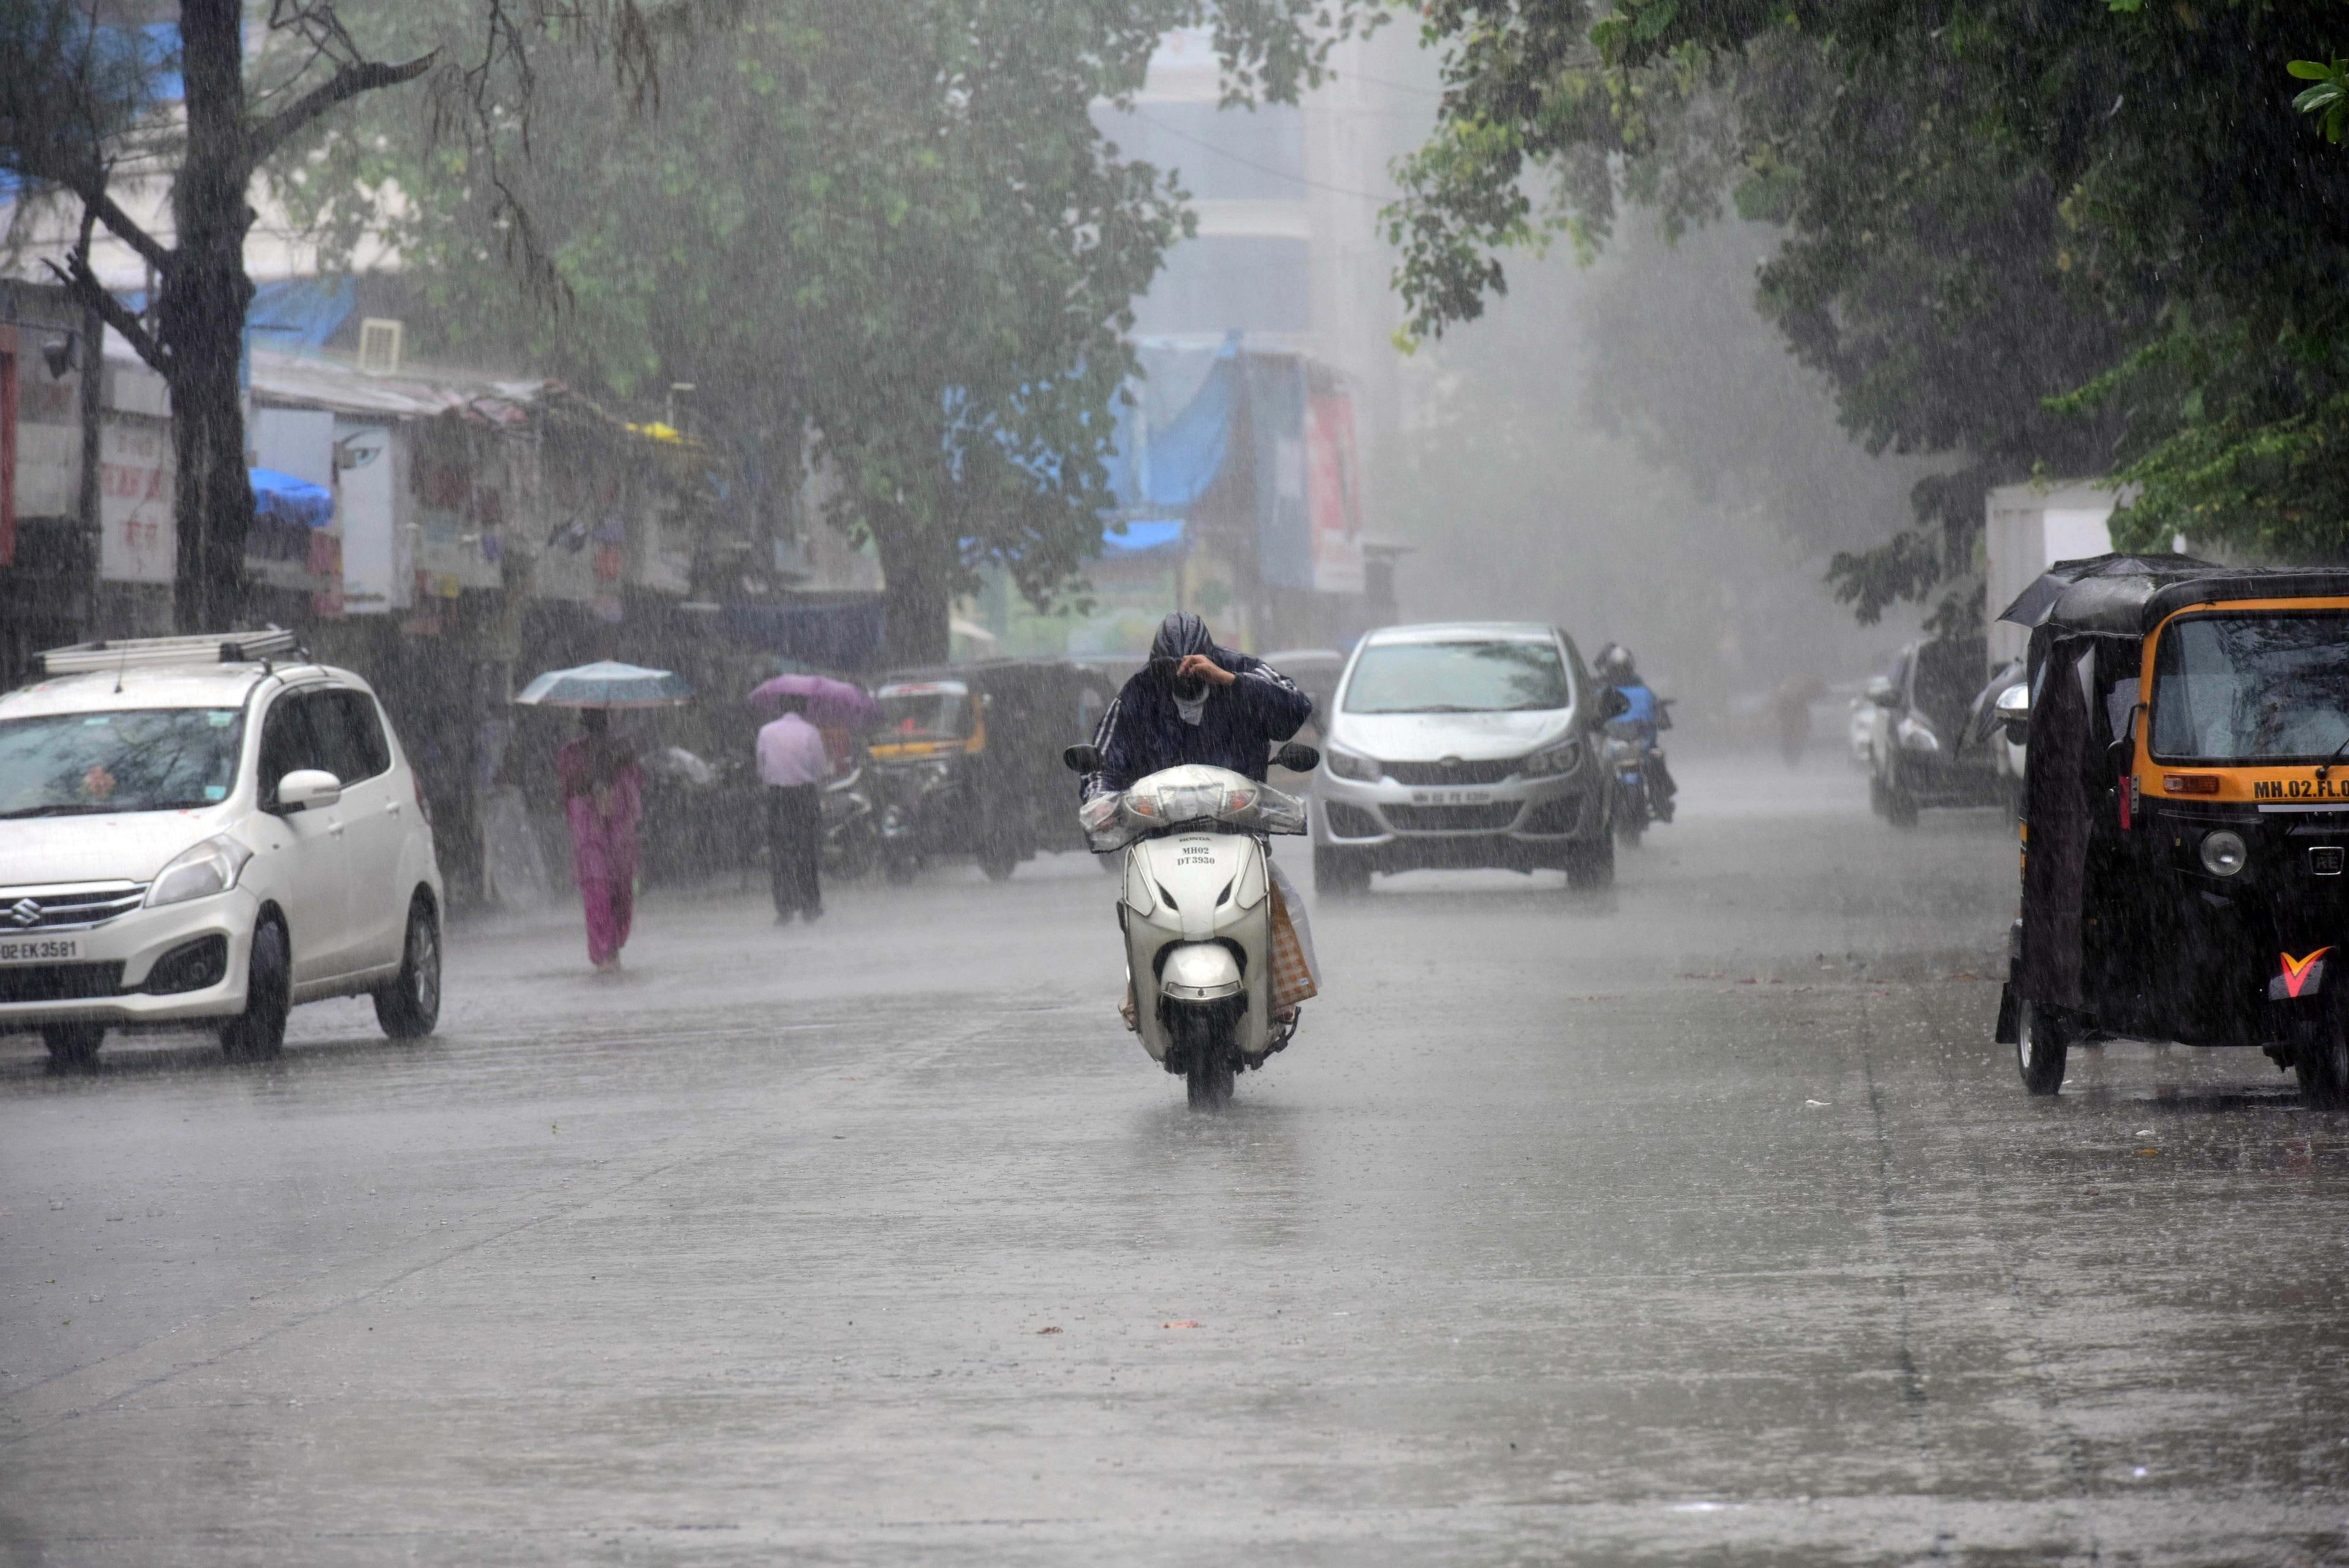 Cyclone Tauktae effect: Light rains, gusty winds in parts of Madhya Pradesh